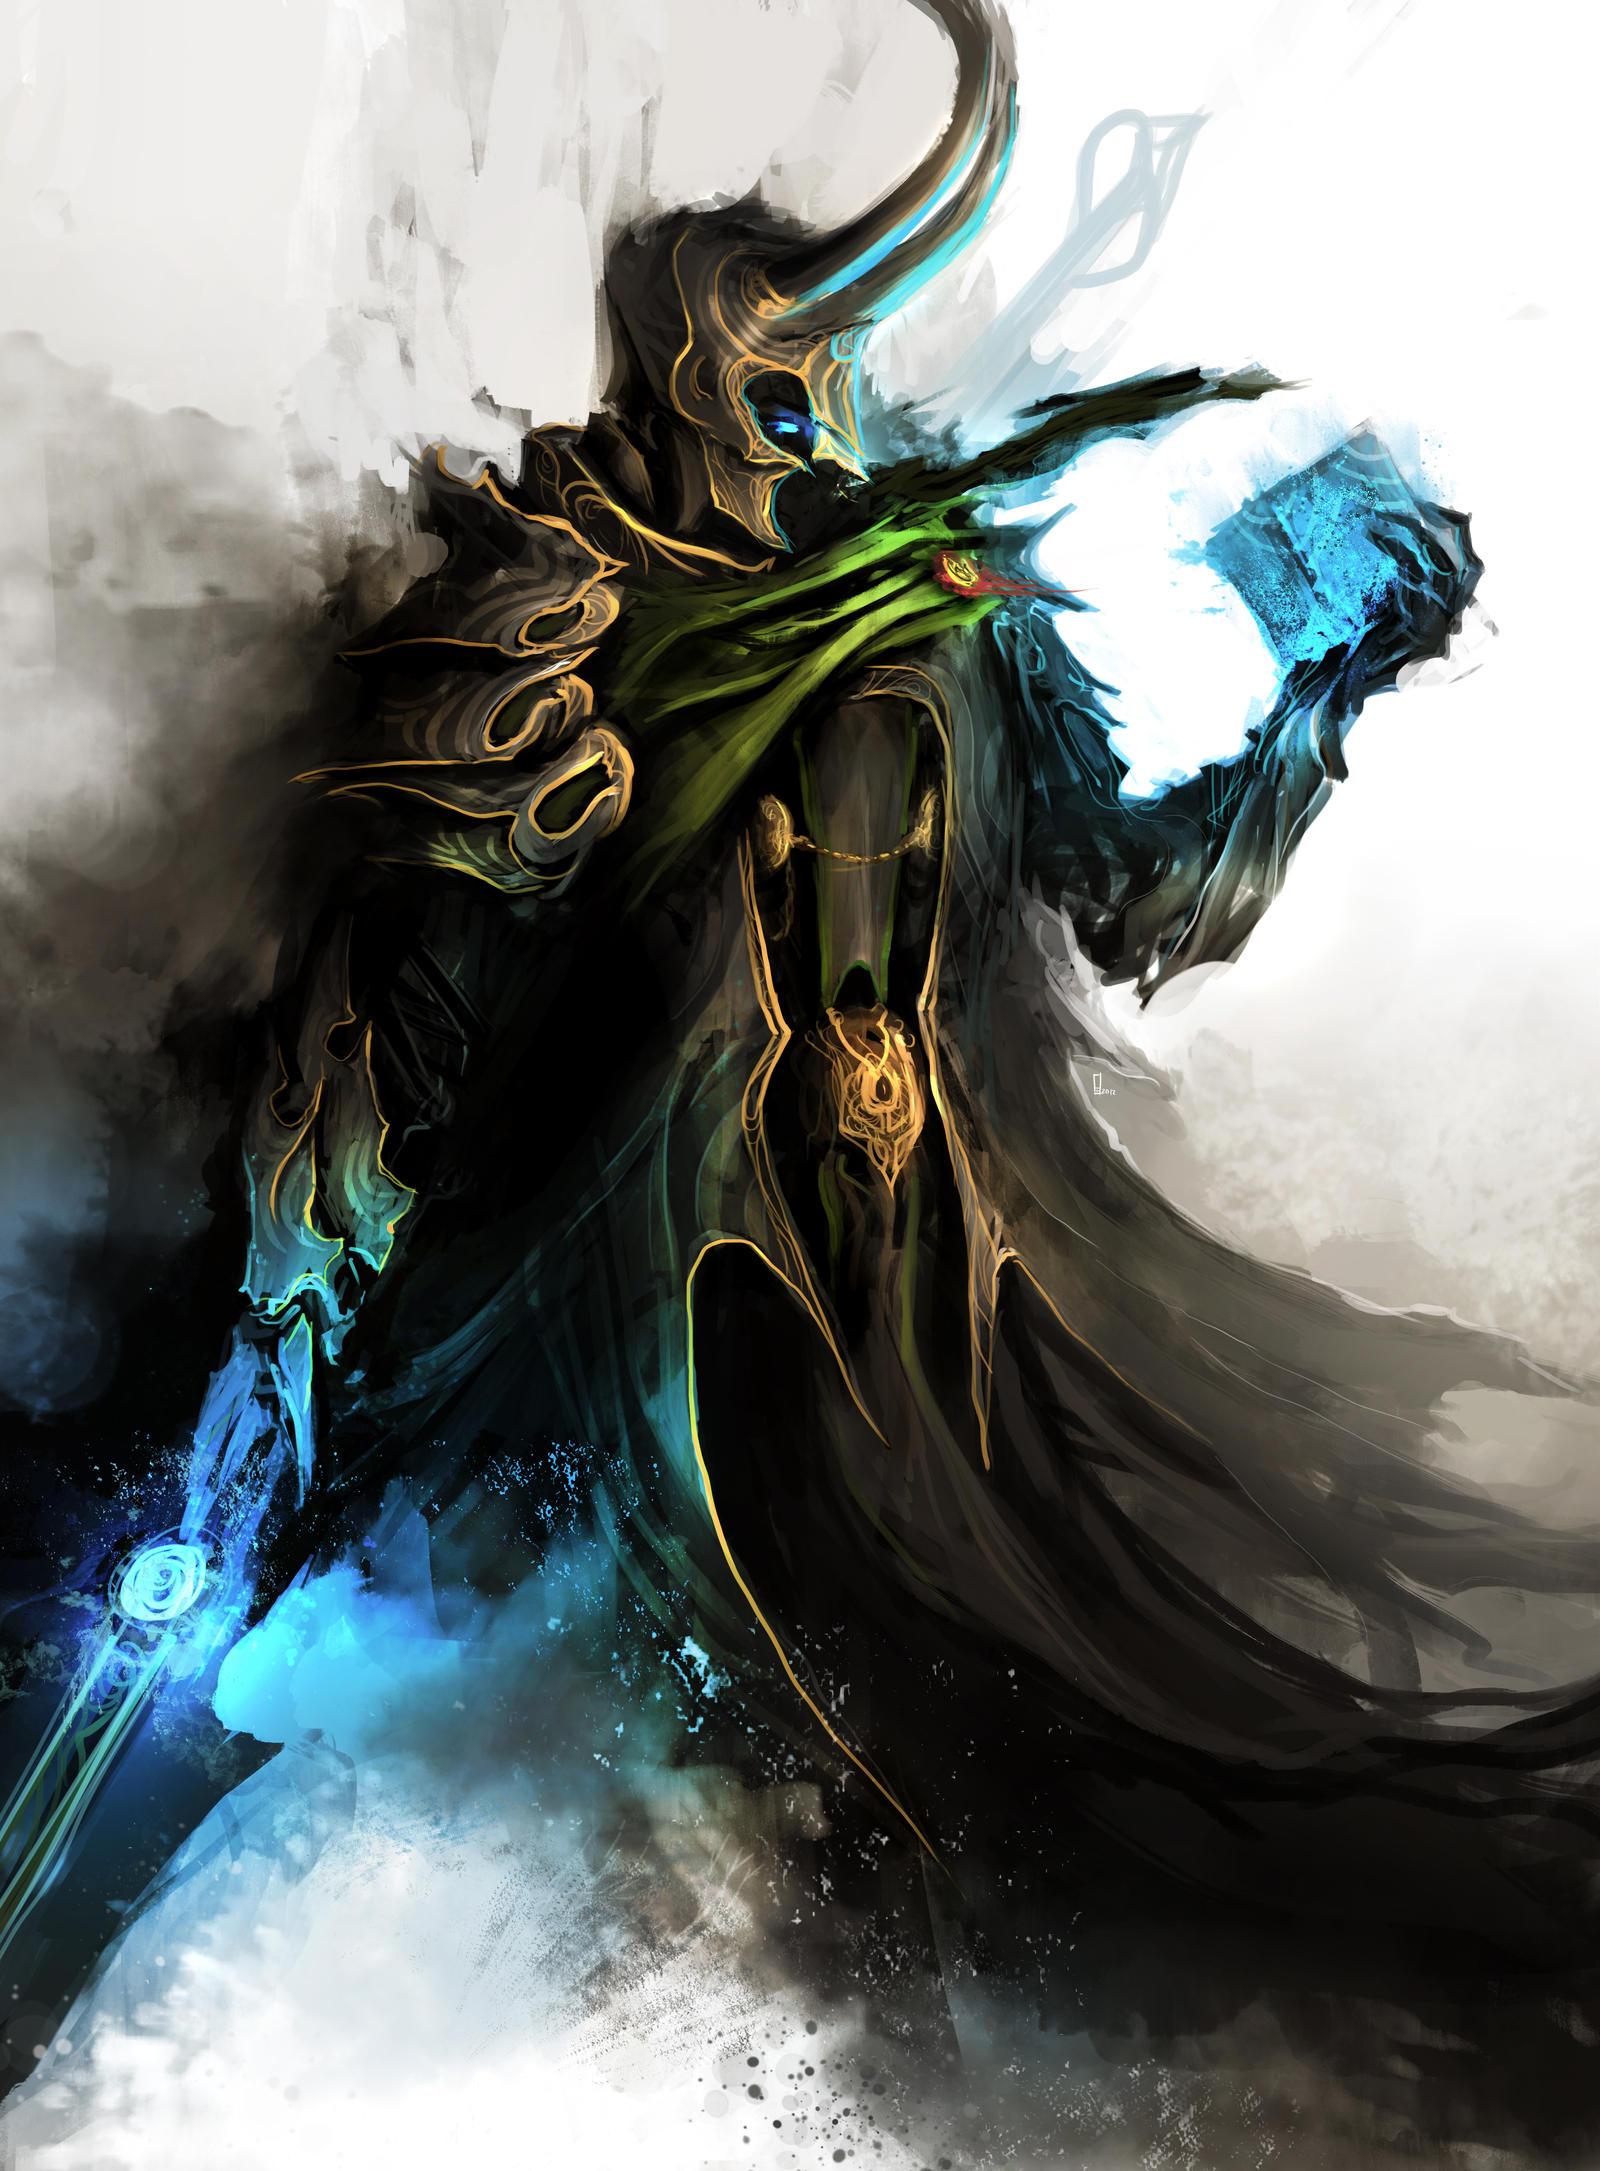 Képek - Page 3 The_avengers___loki_by_thedurrrrian-d52yvub